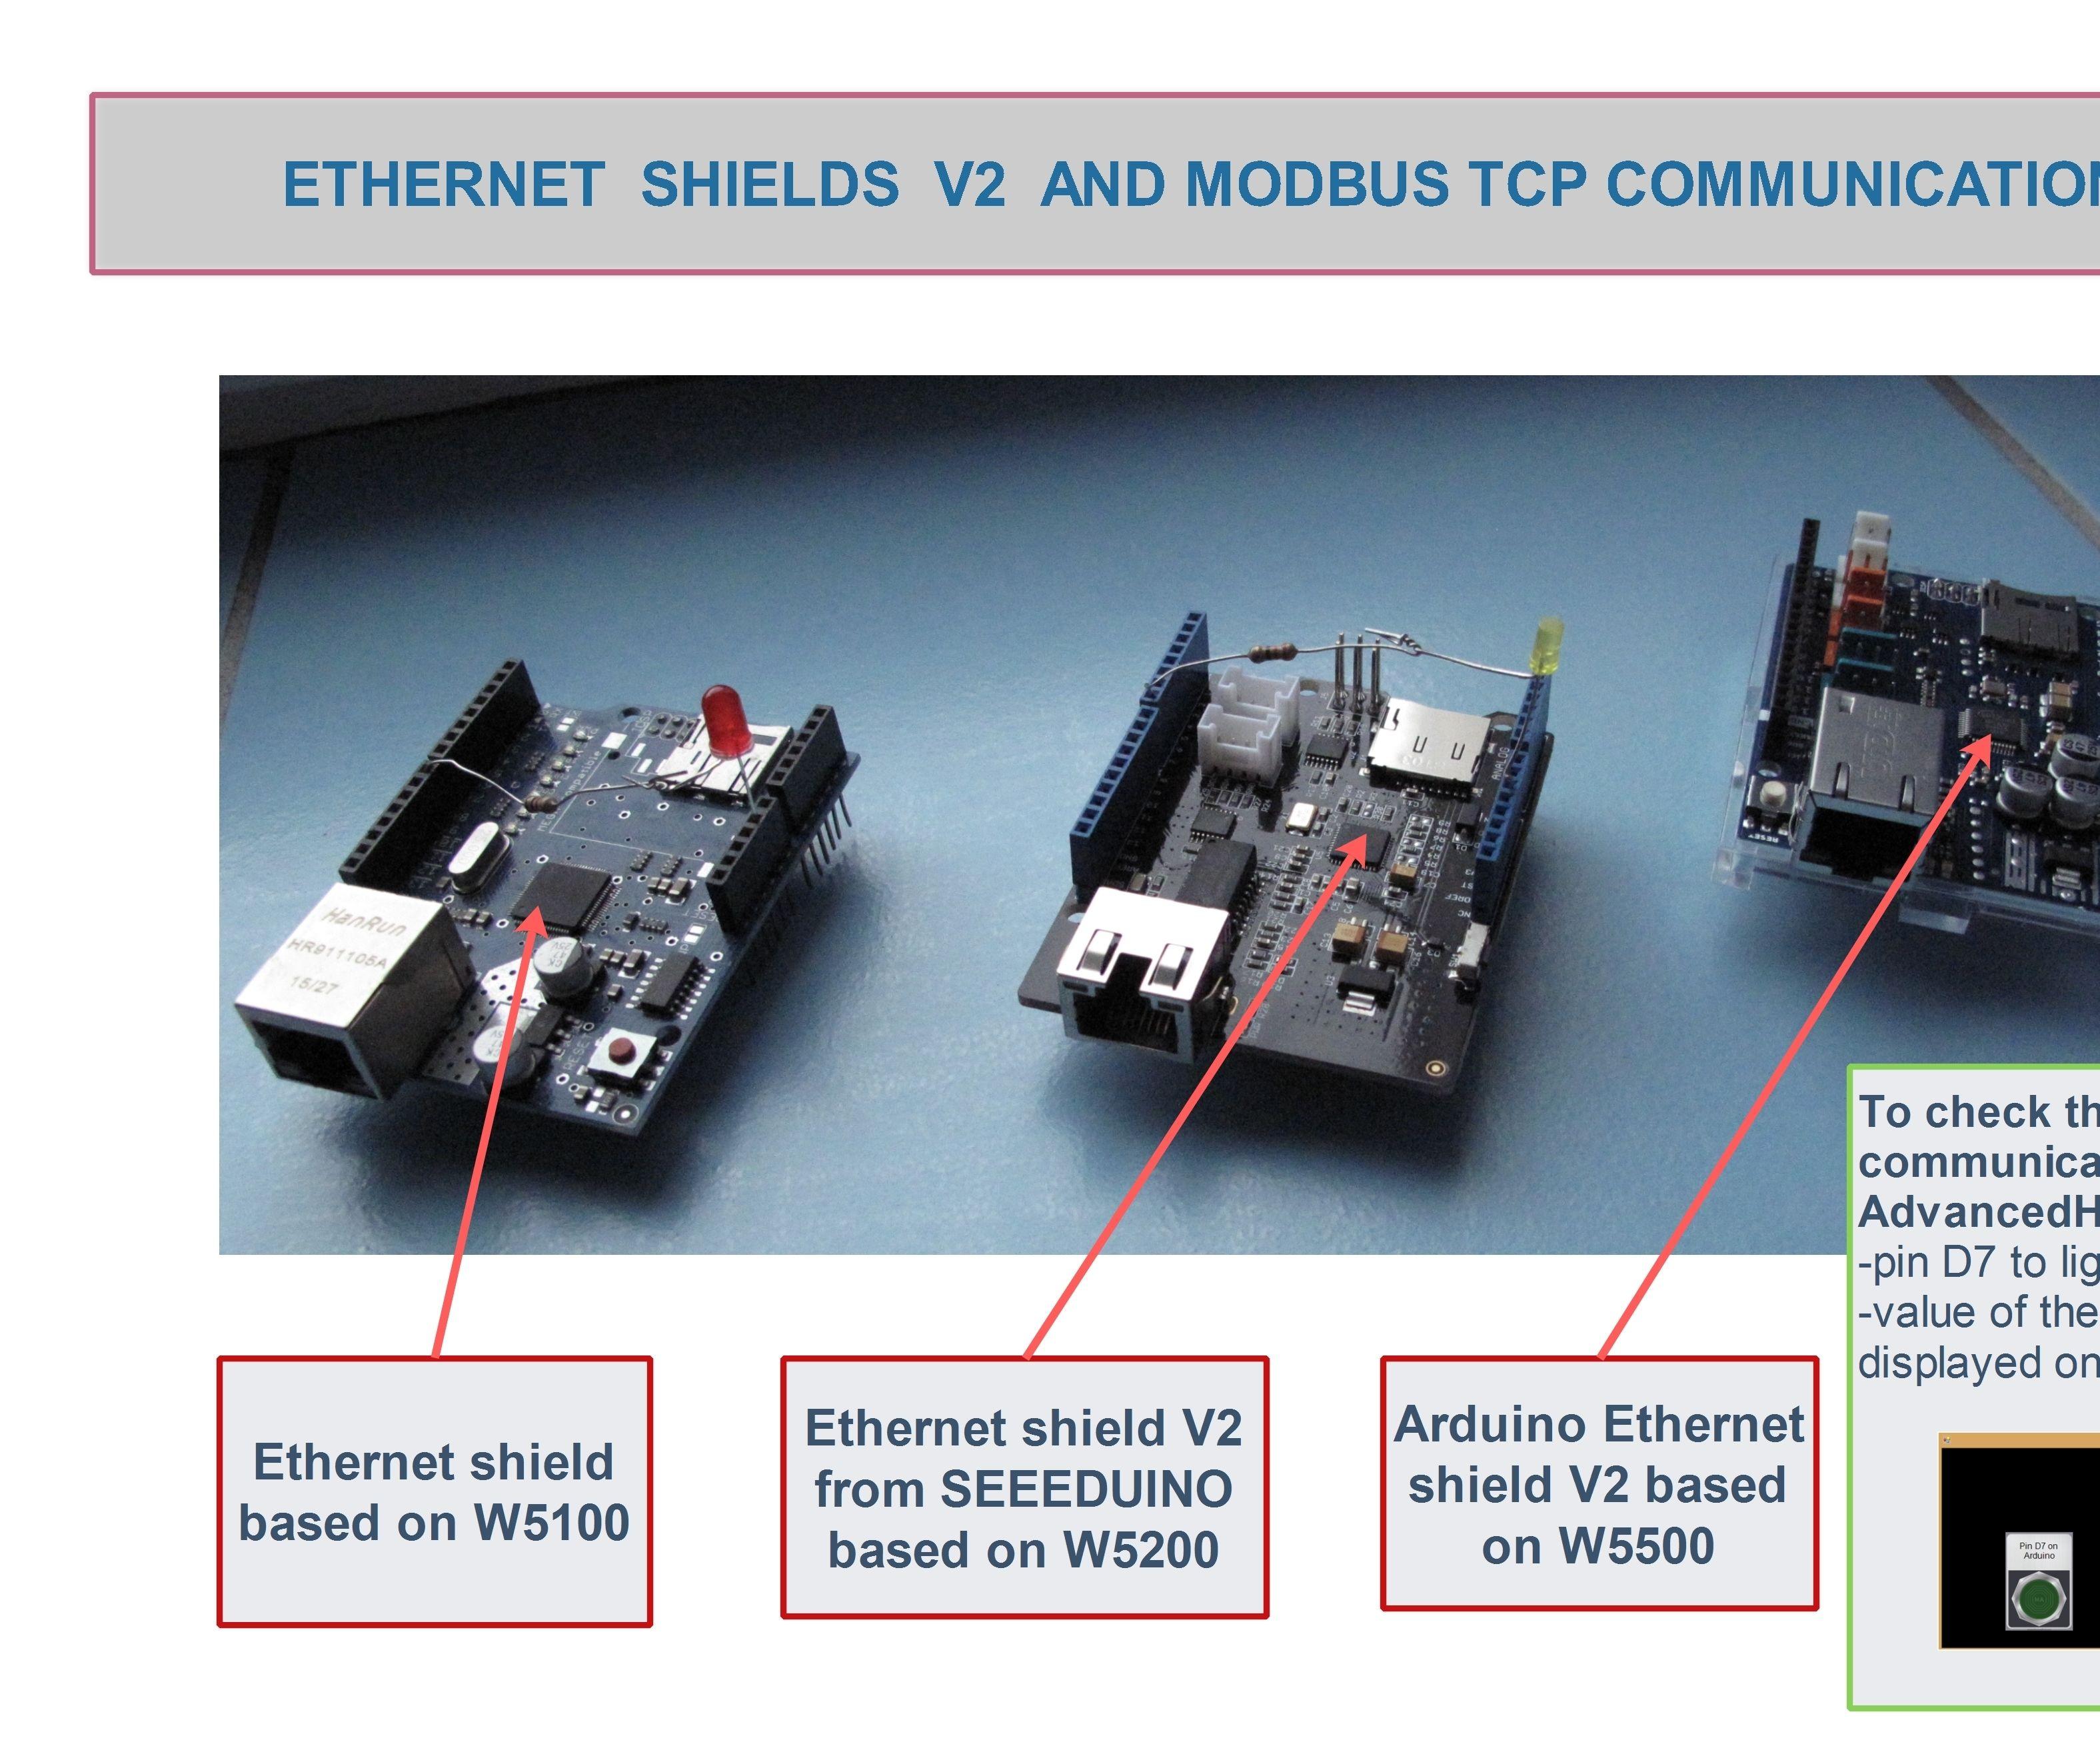 Ethernet Shields V2.0 and Modbus TCP Communication